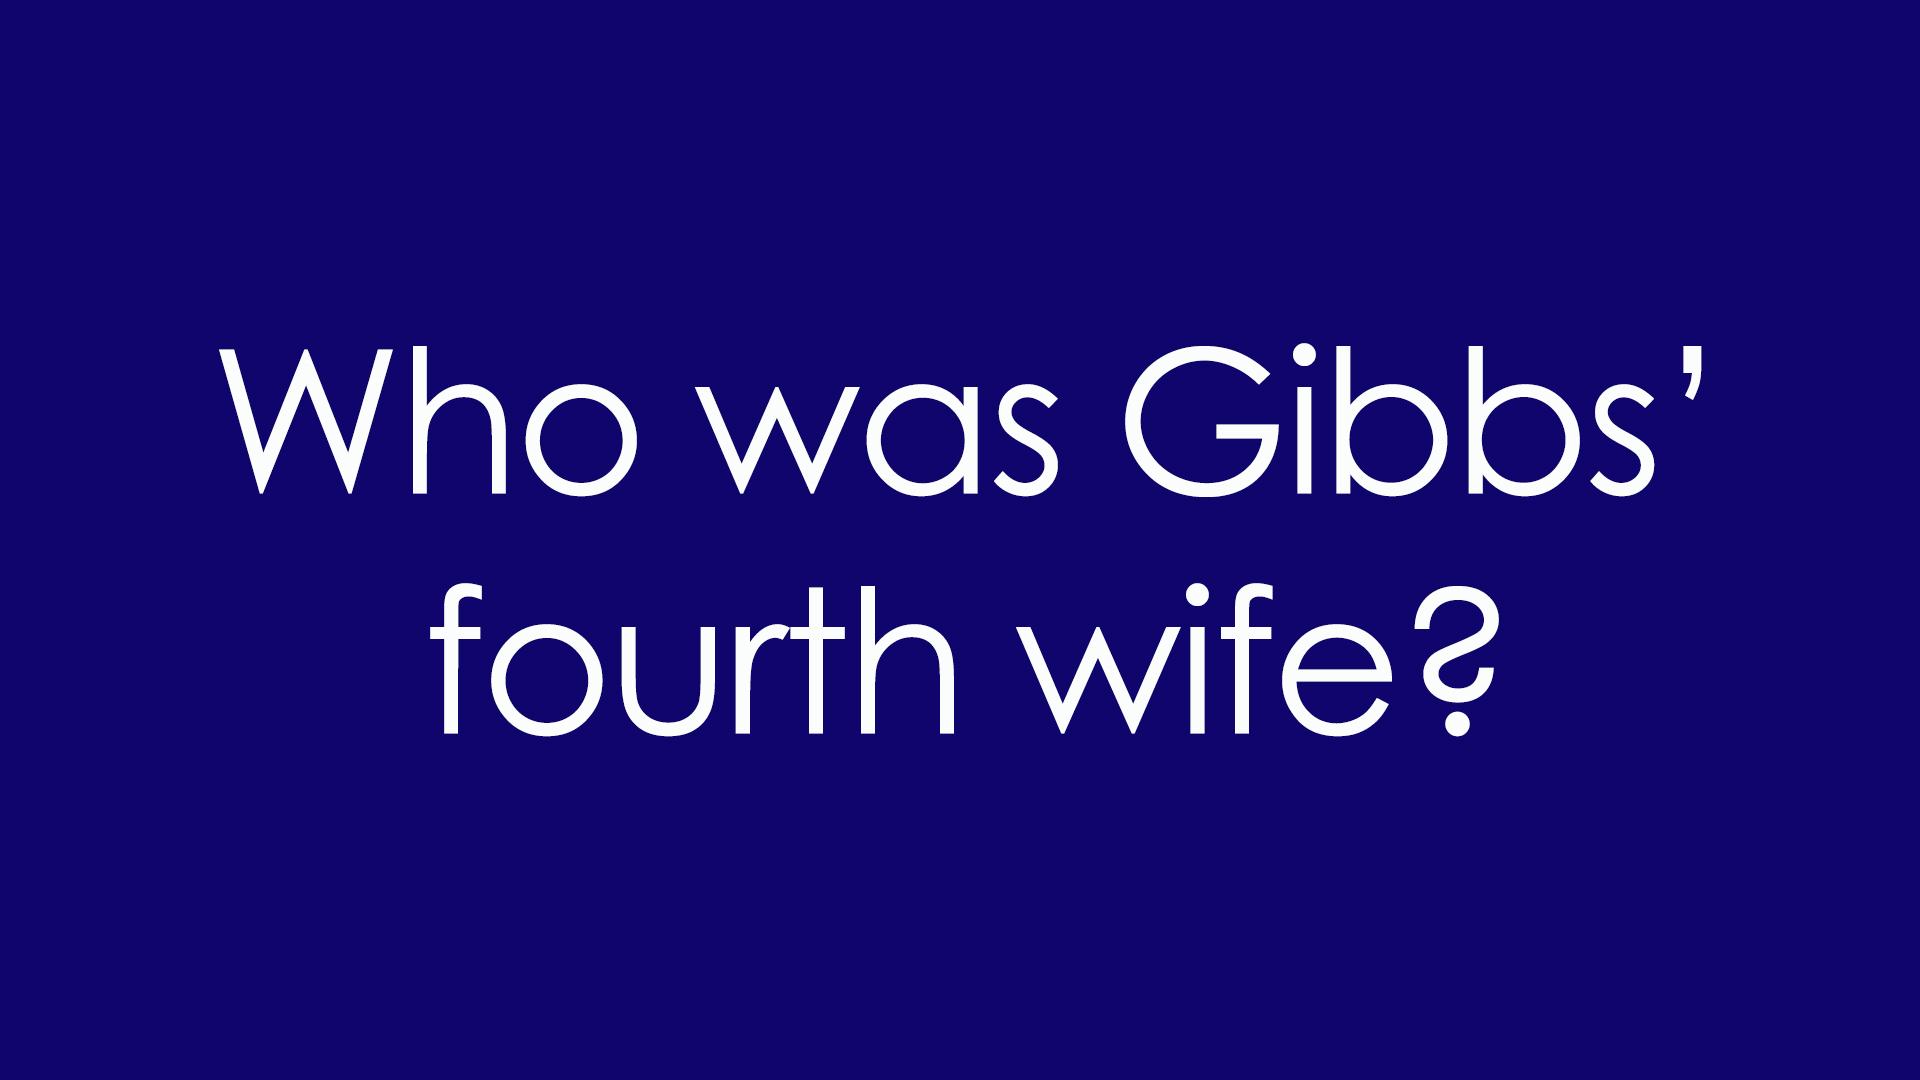 8. Who was Gibbs' fourth wife?